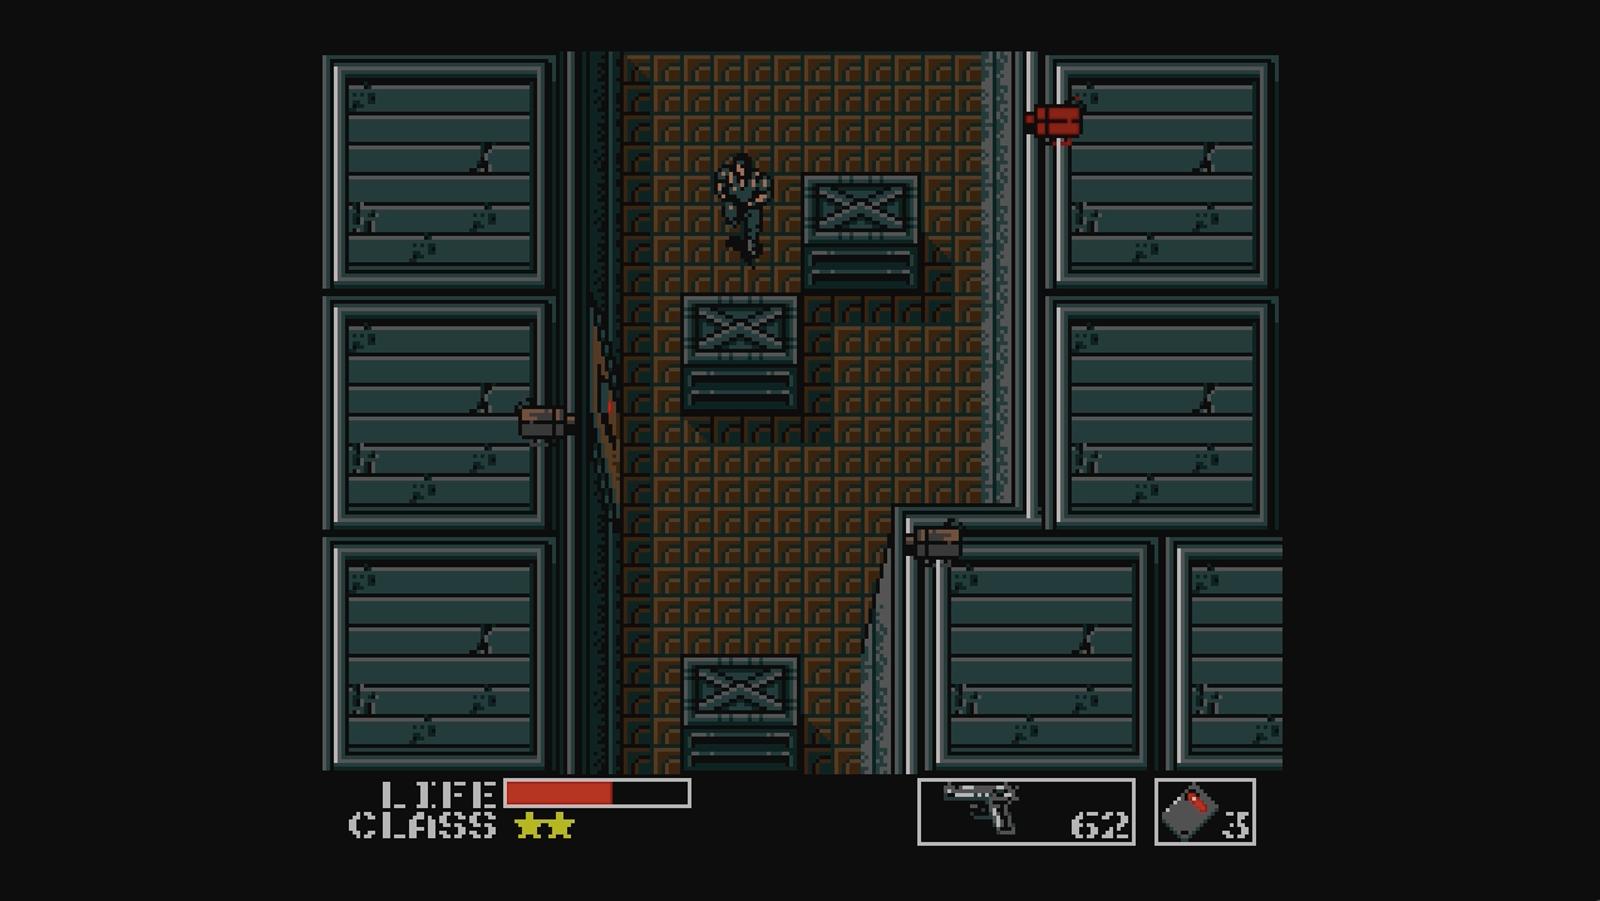 Metal Gear Retrospective: Snake's Punishment Begins